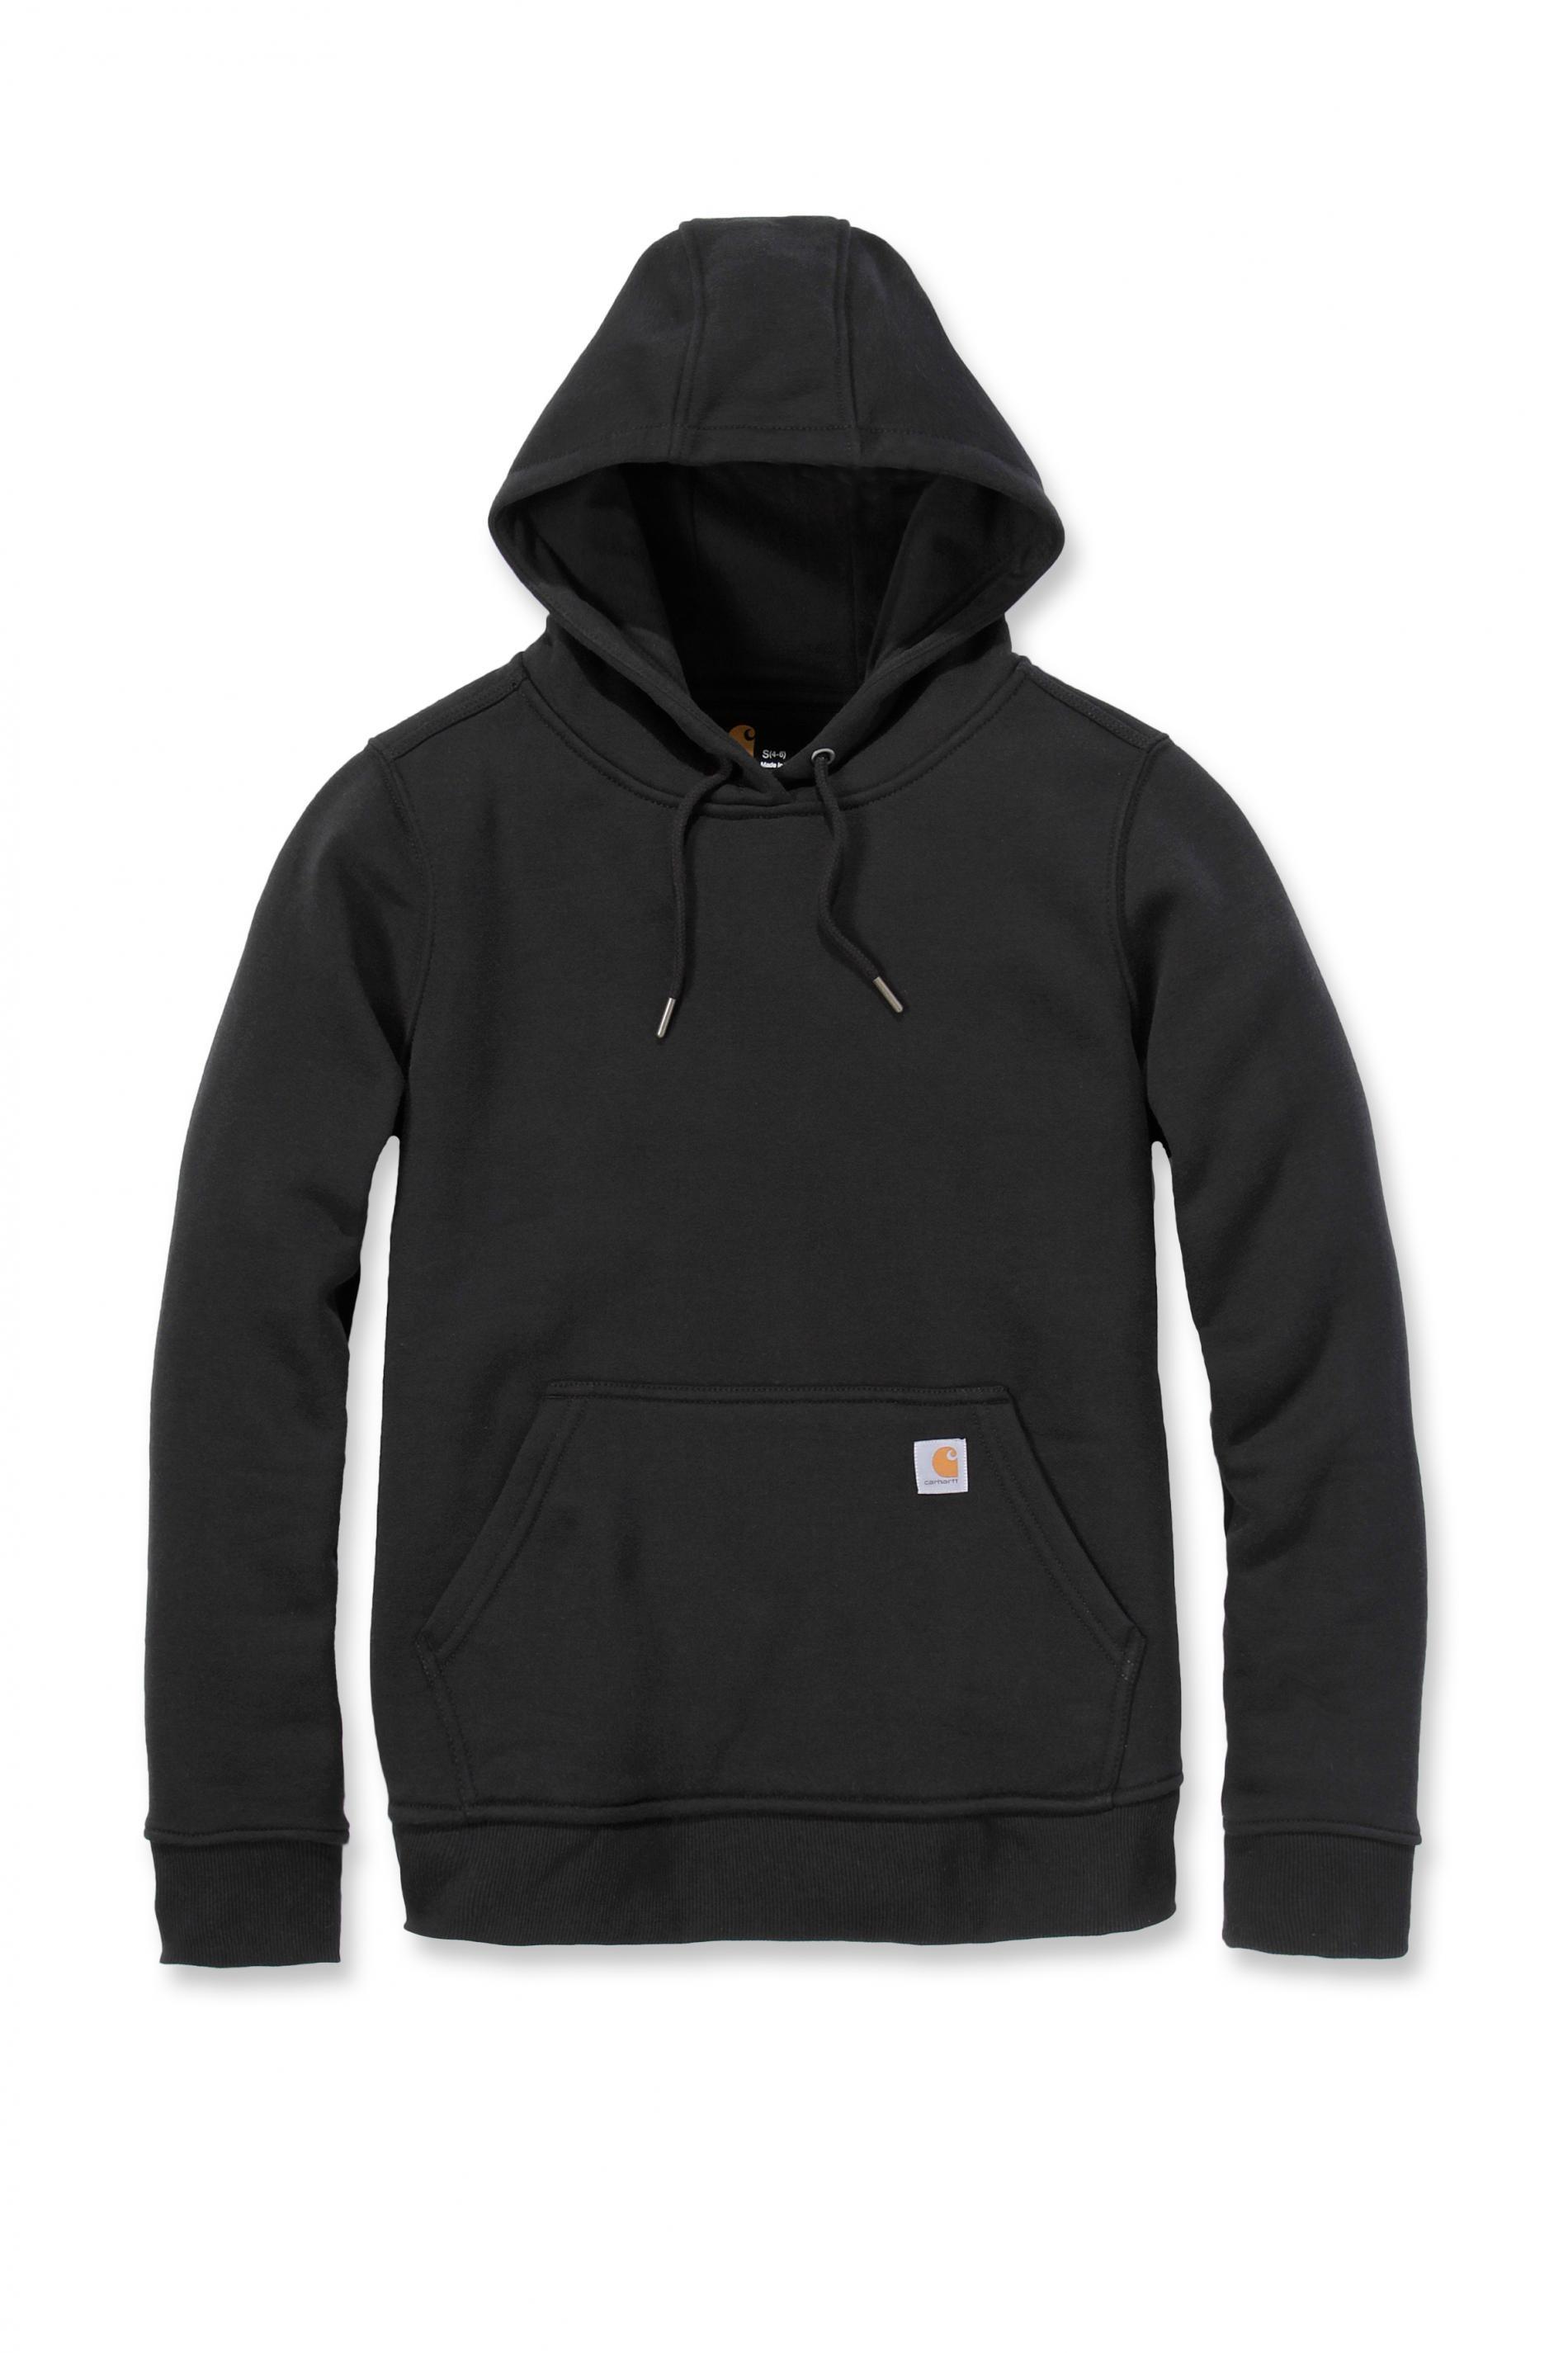 Carhartt Womens Pullover Sweatshirt Hoody : Black